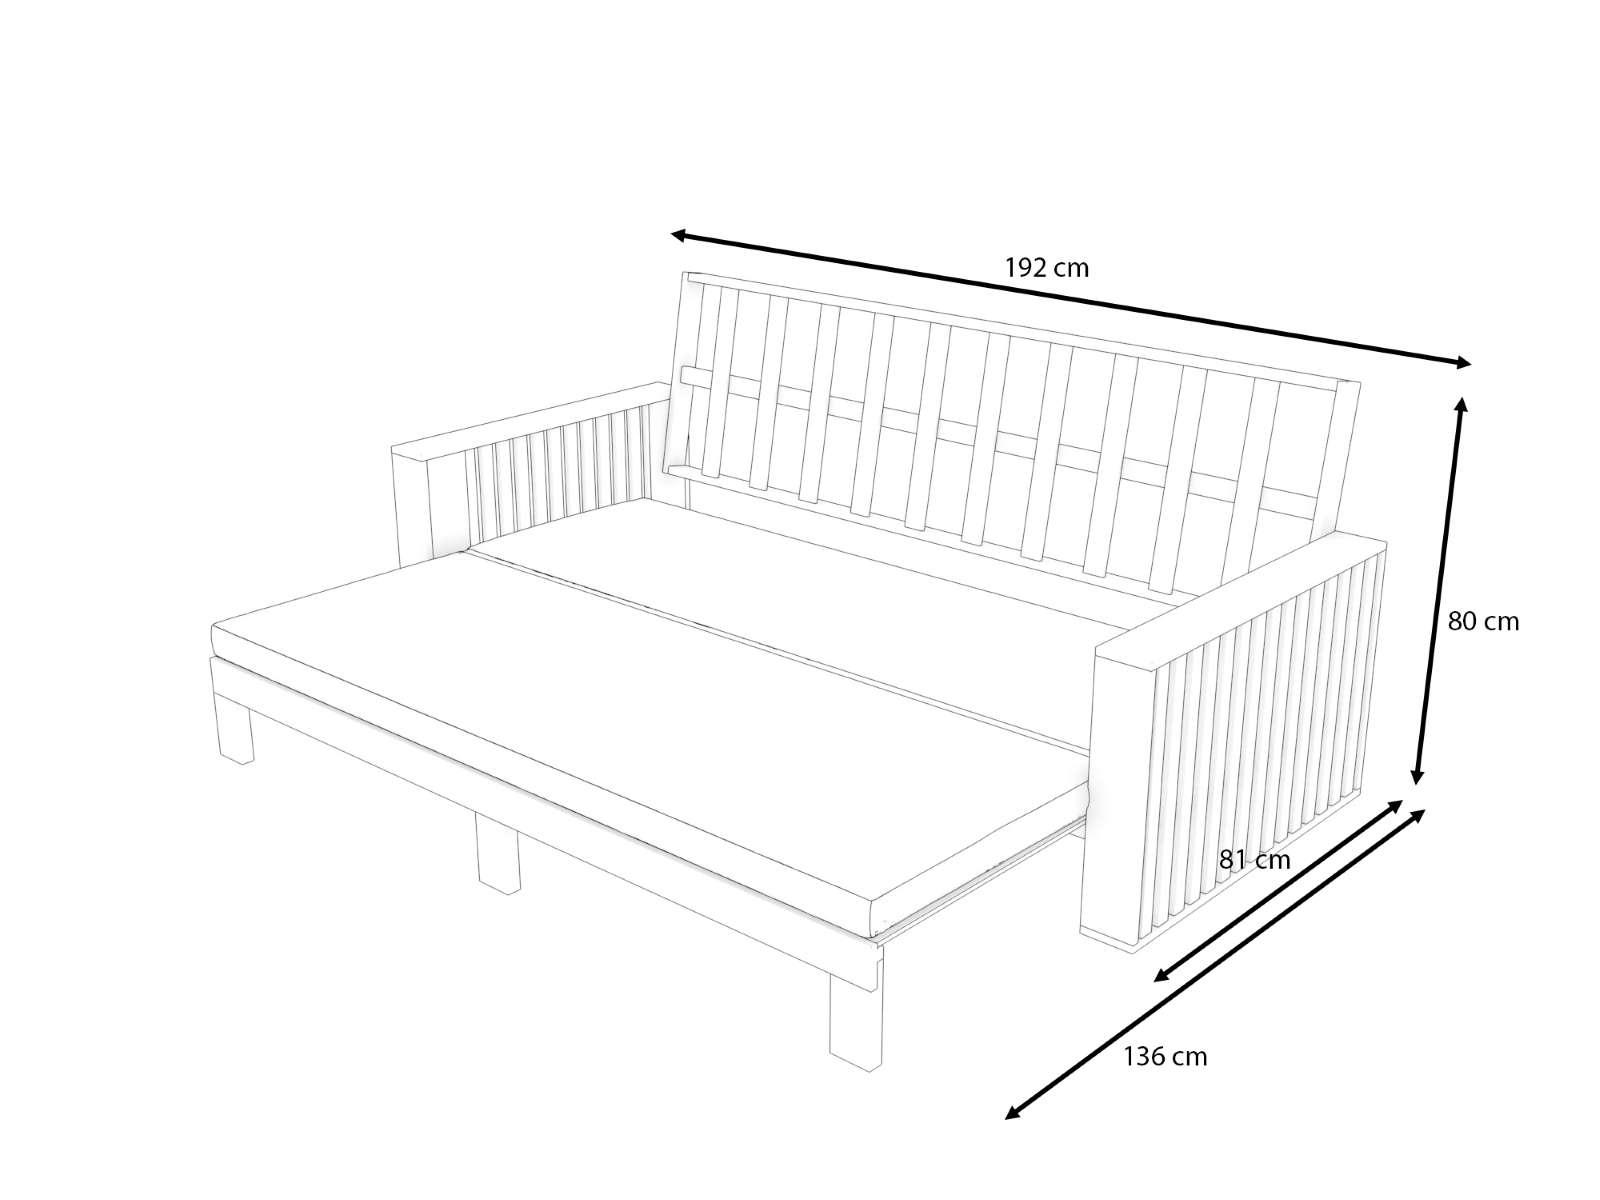 Sofa Cama De Madera De Acacia Savoy